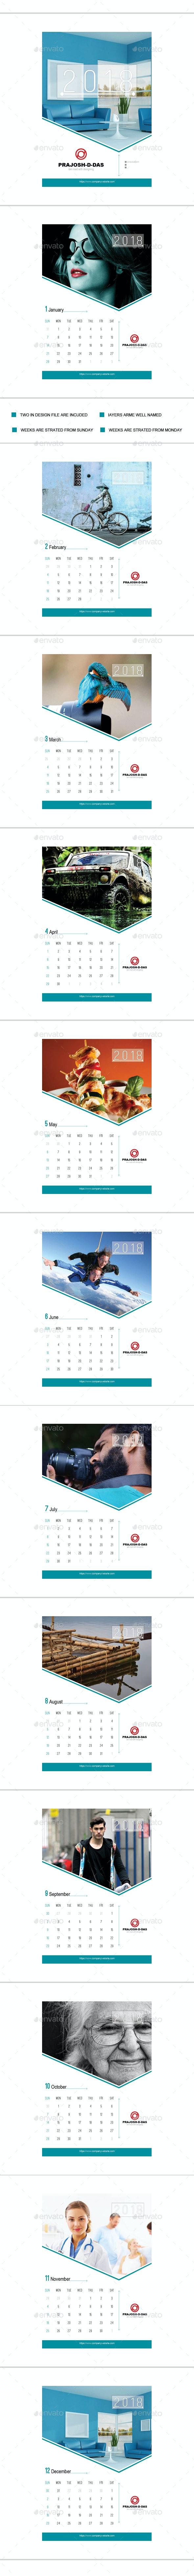 2018 Wall Calendar - Calendars Stationery